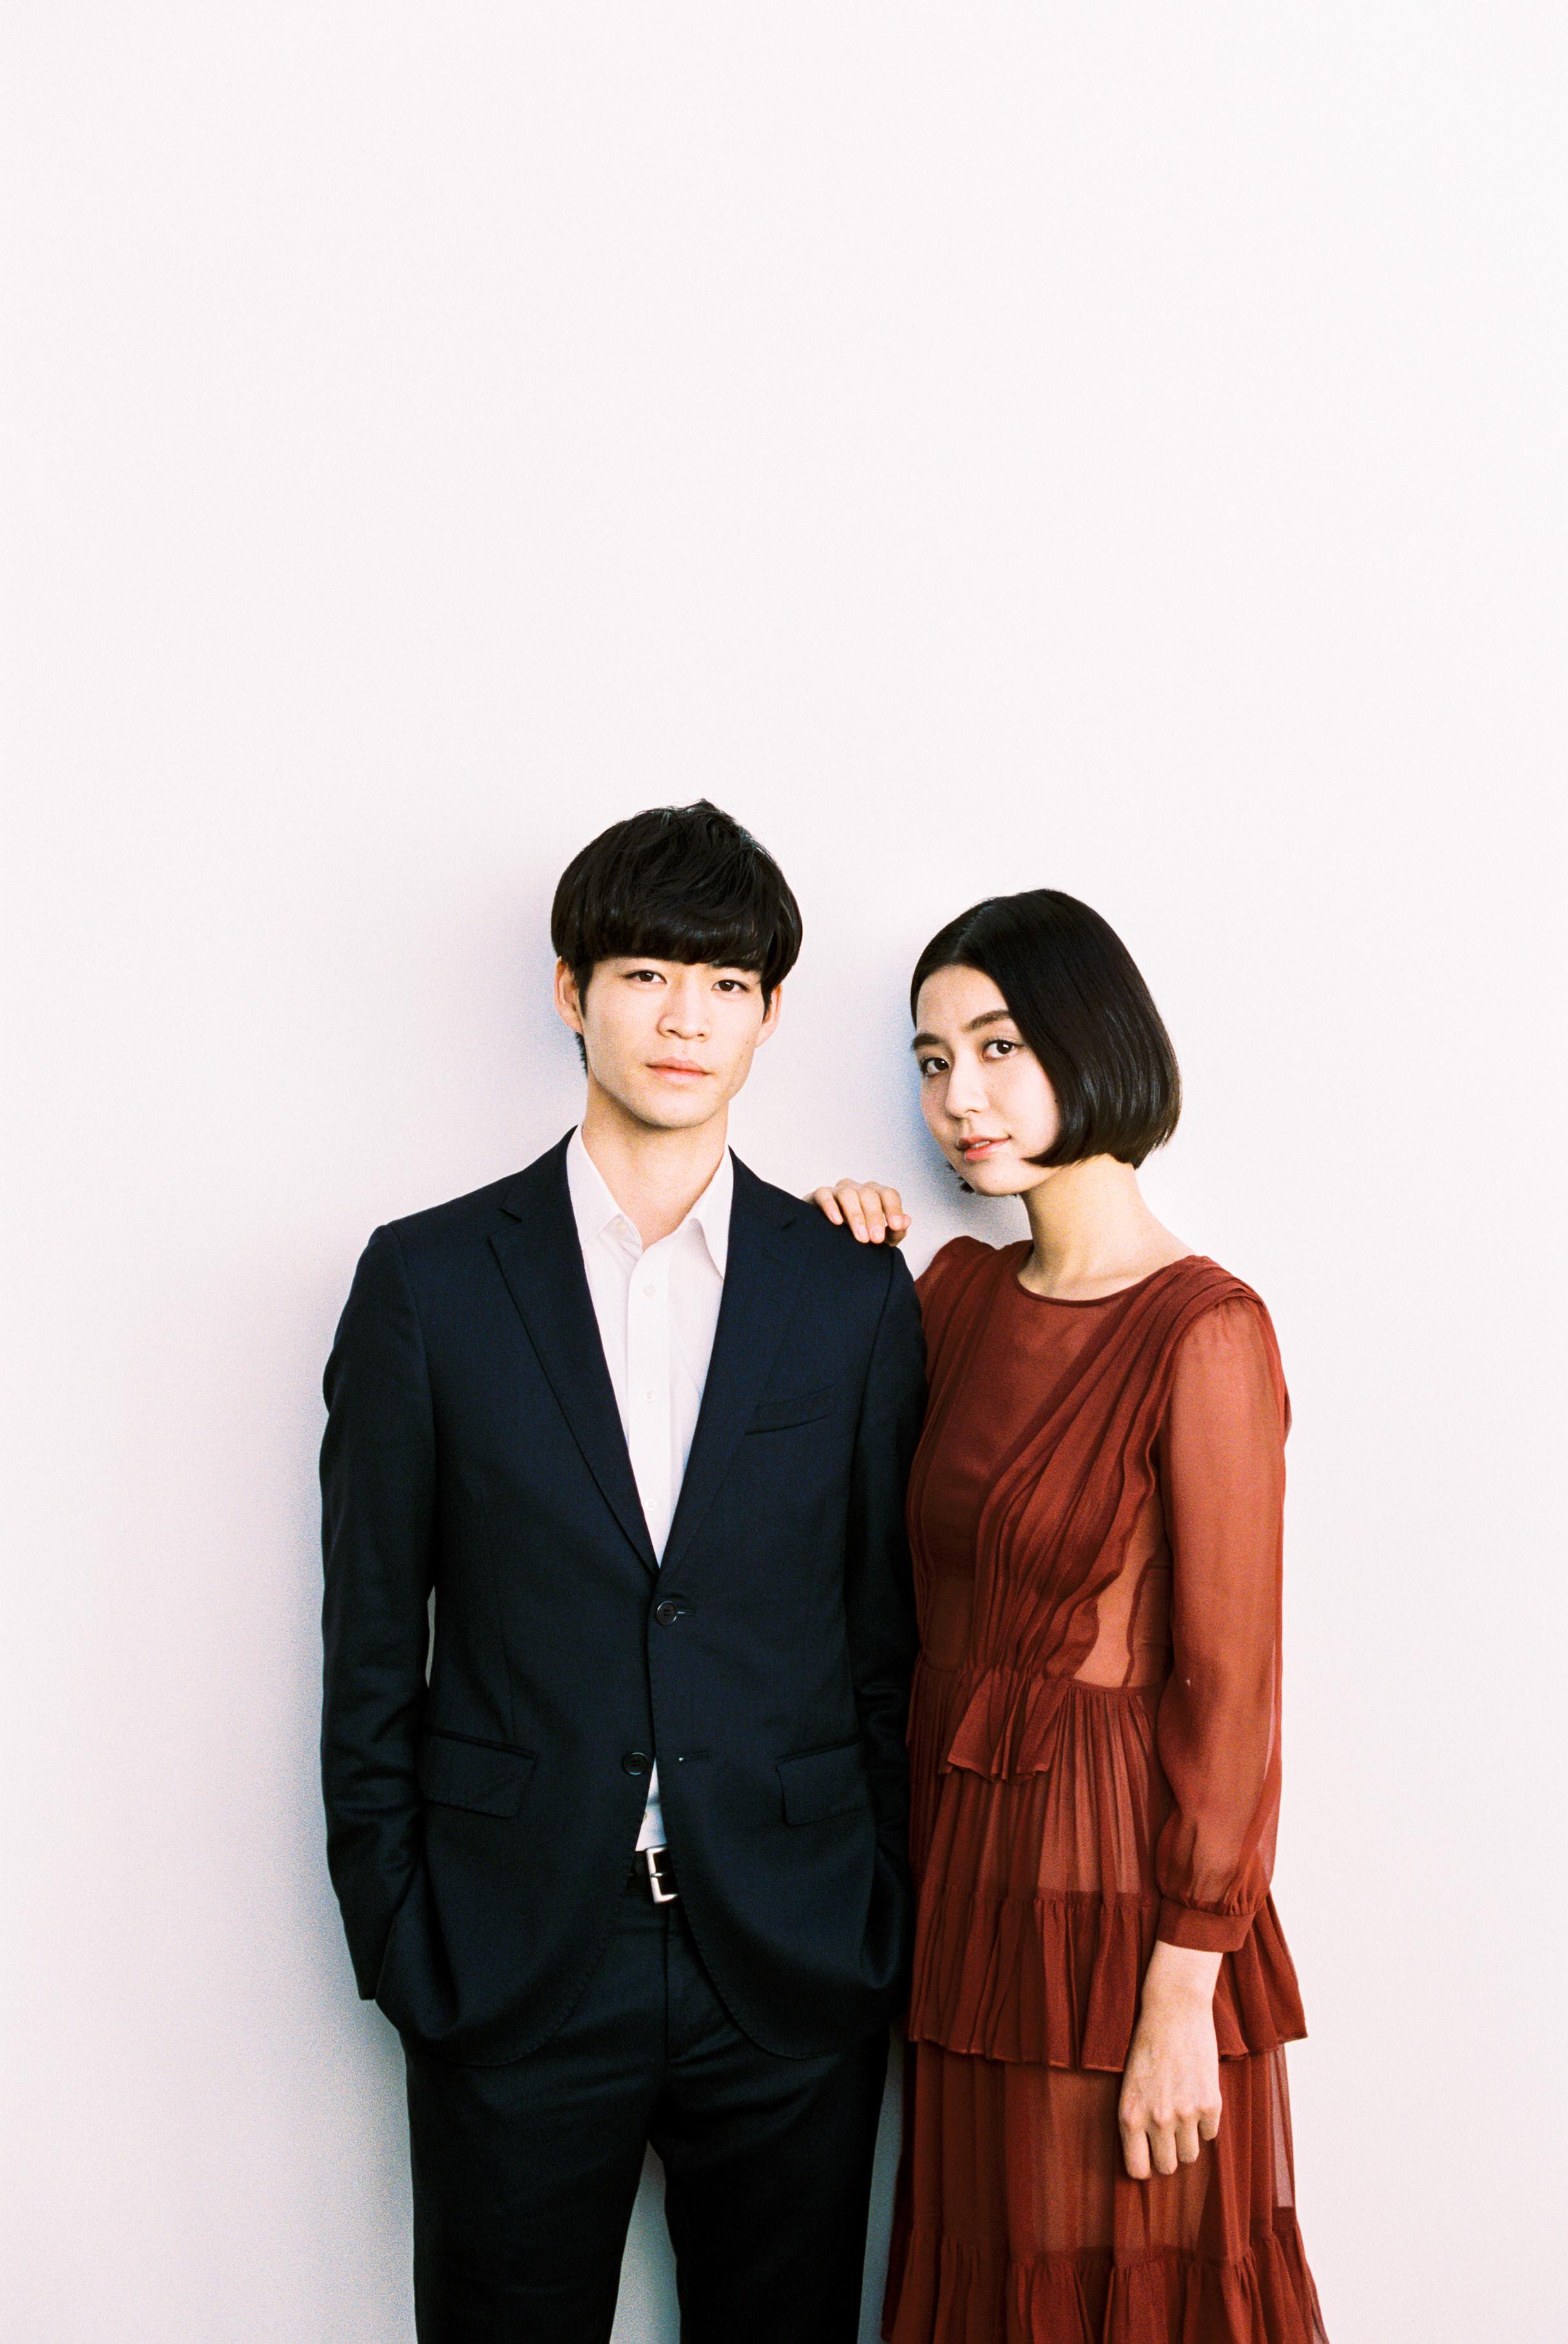 20171110-japanworkshopfilm (36 of 129).jpg